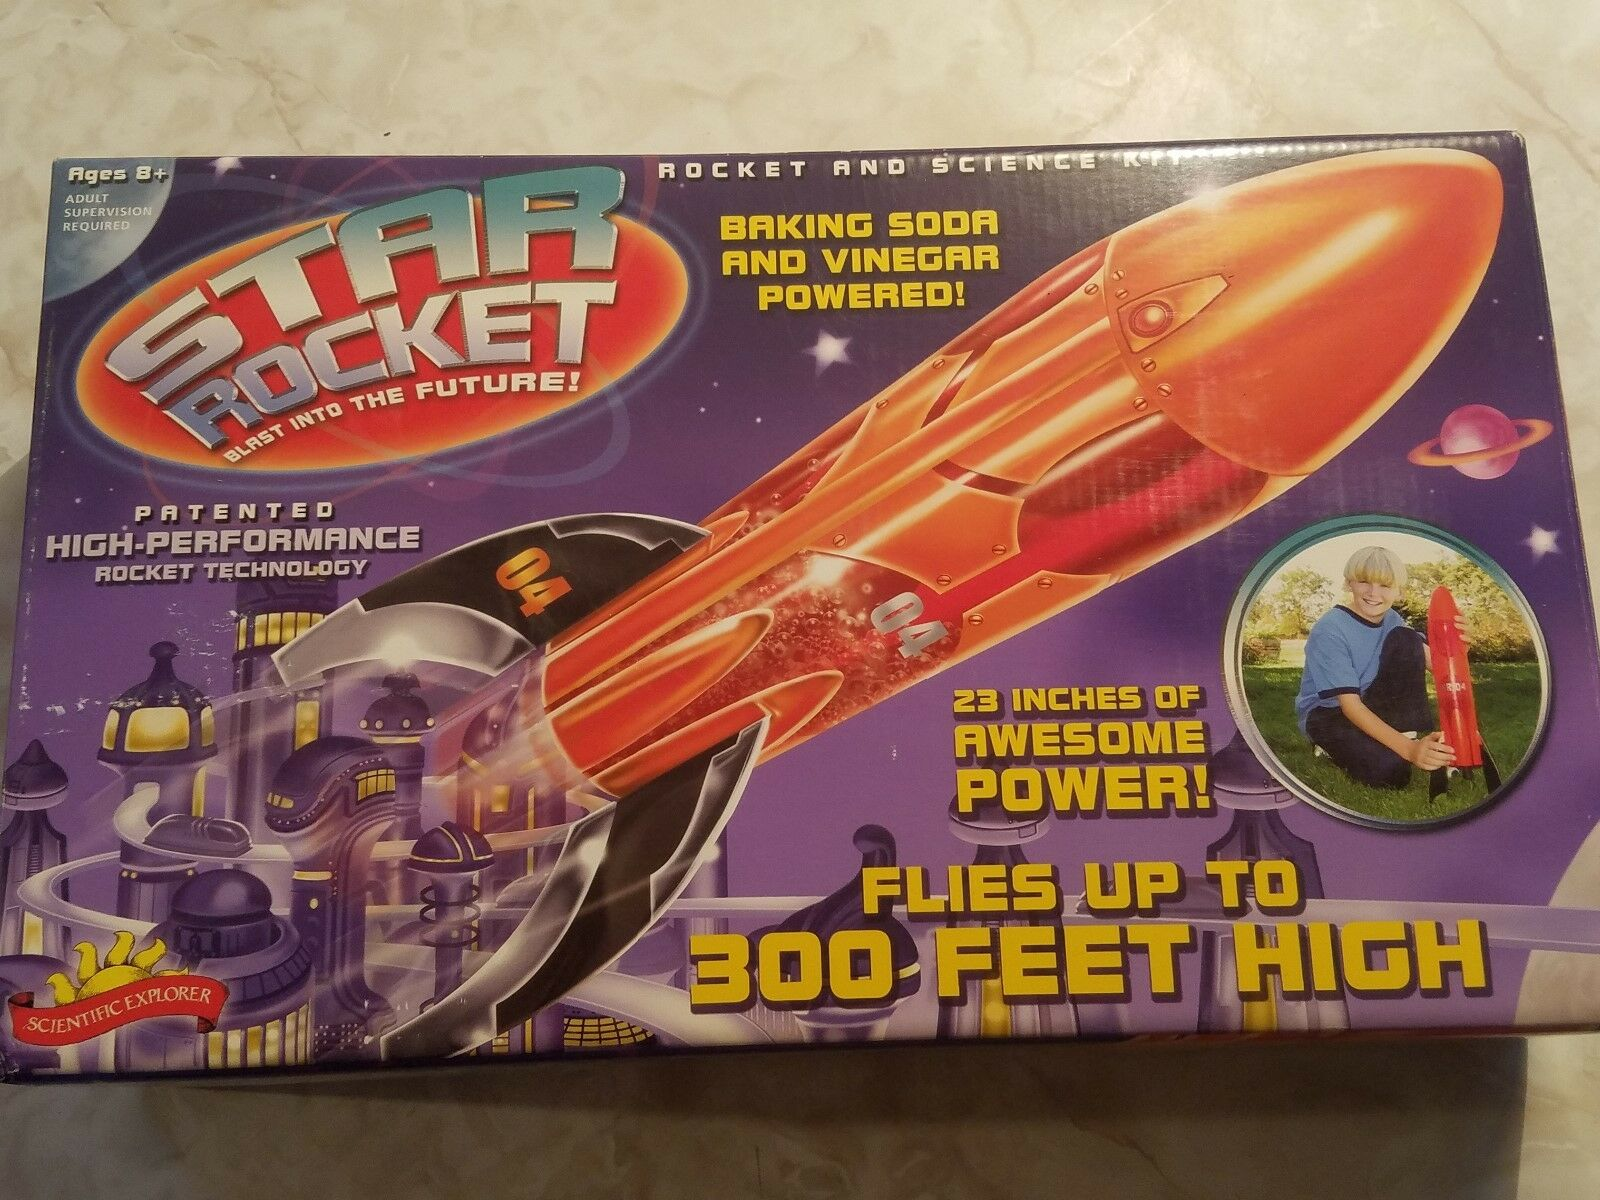 Scientific Explorer Star Rocket Science Kit     nuevo